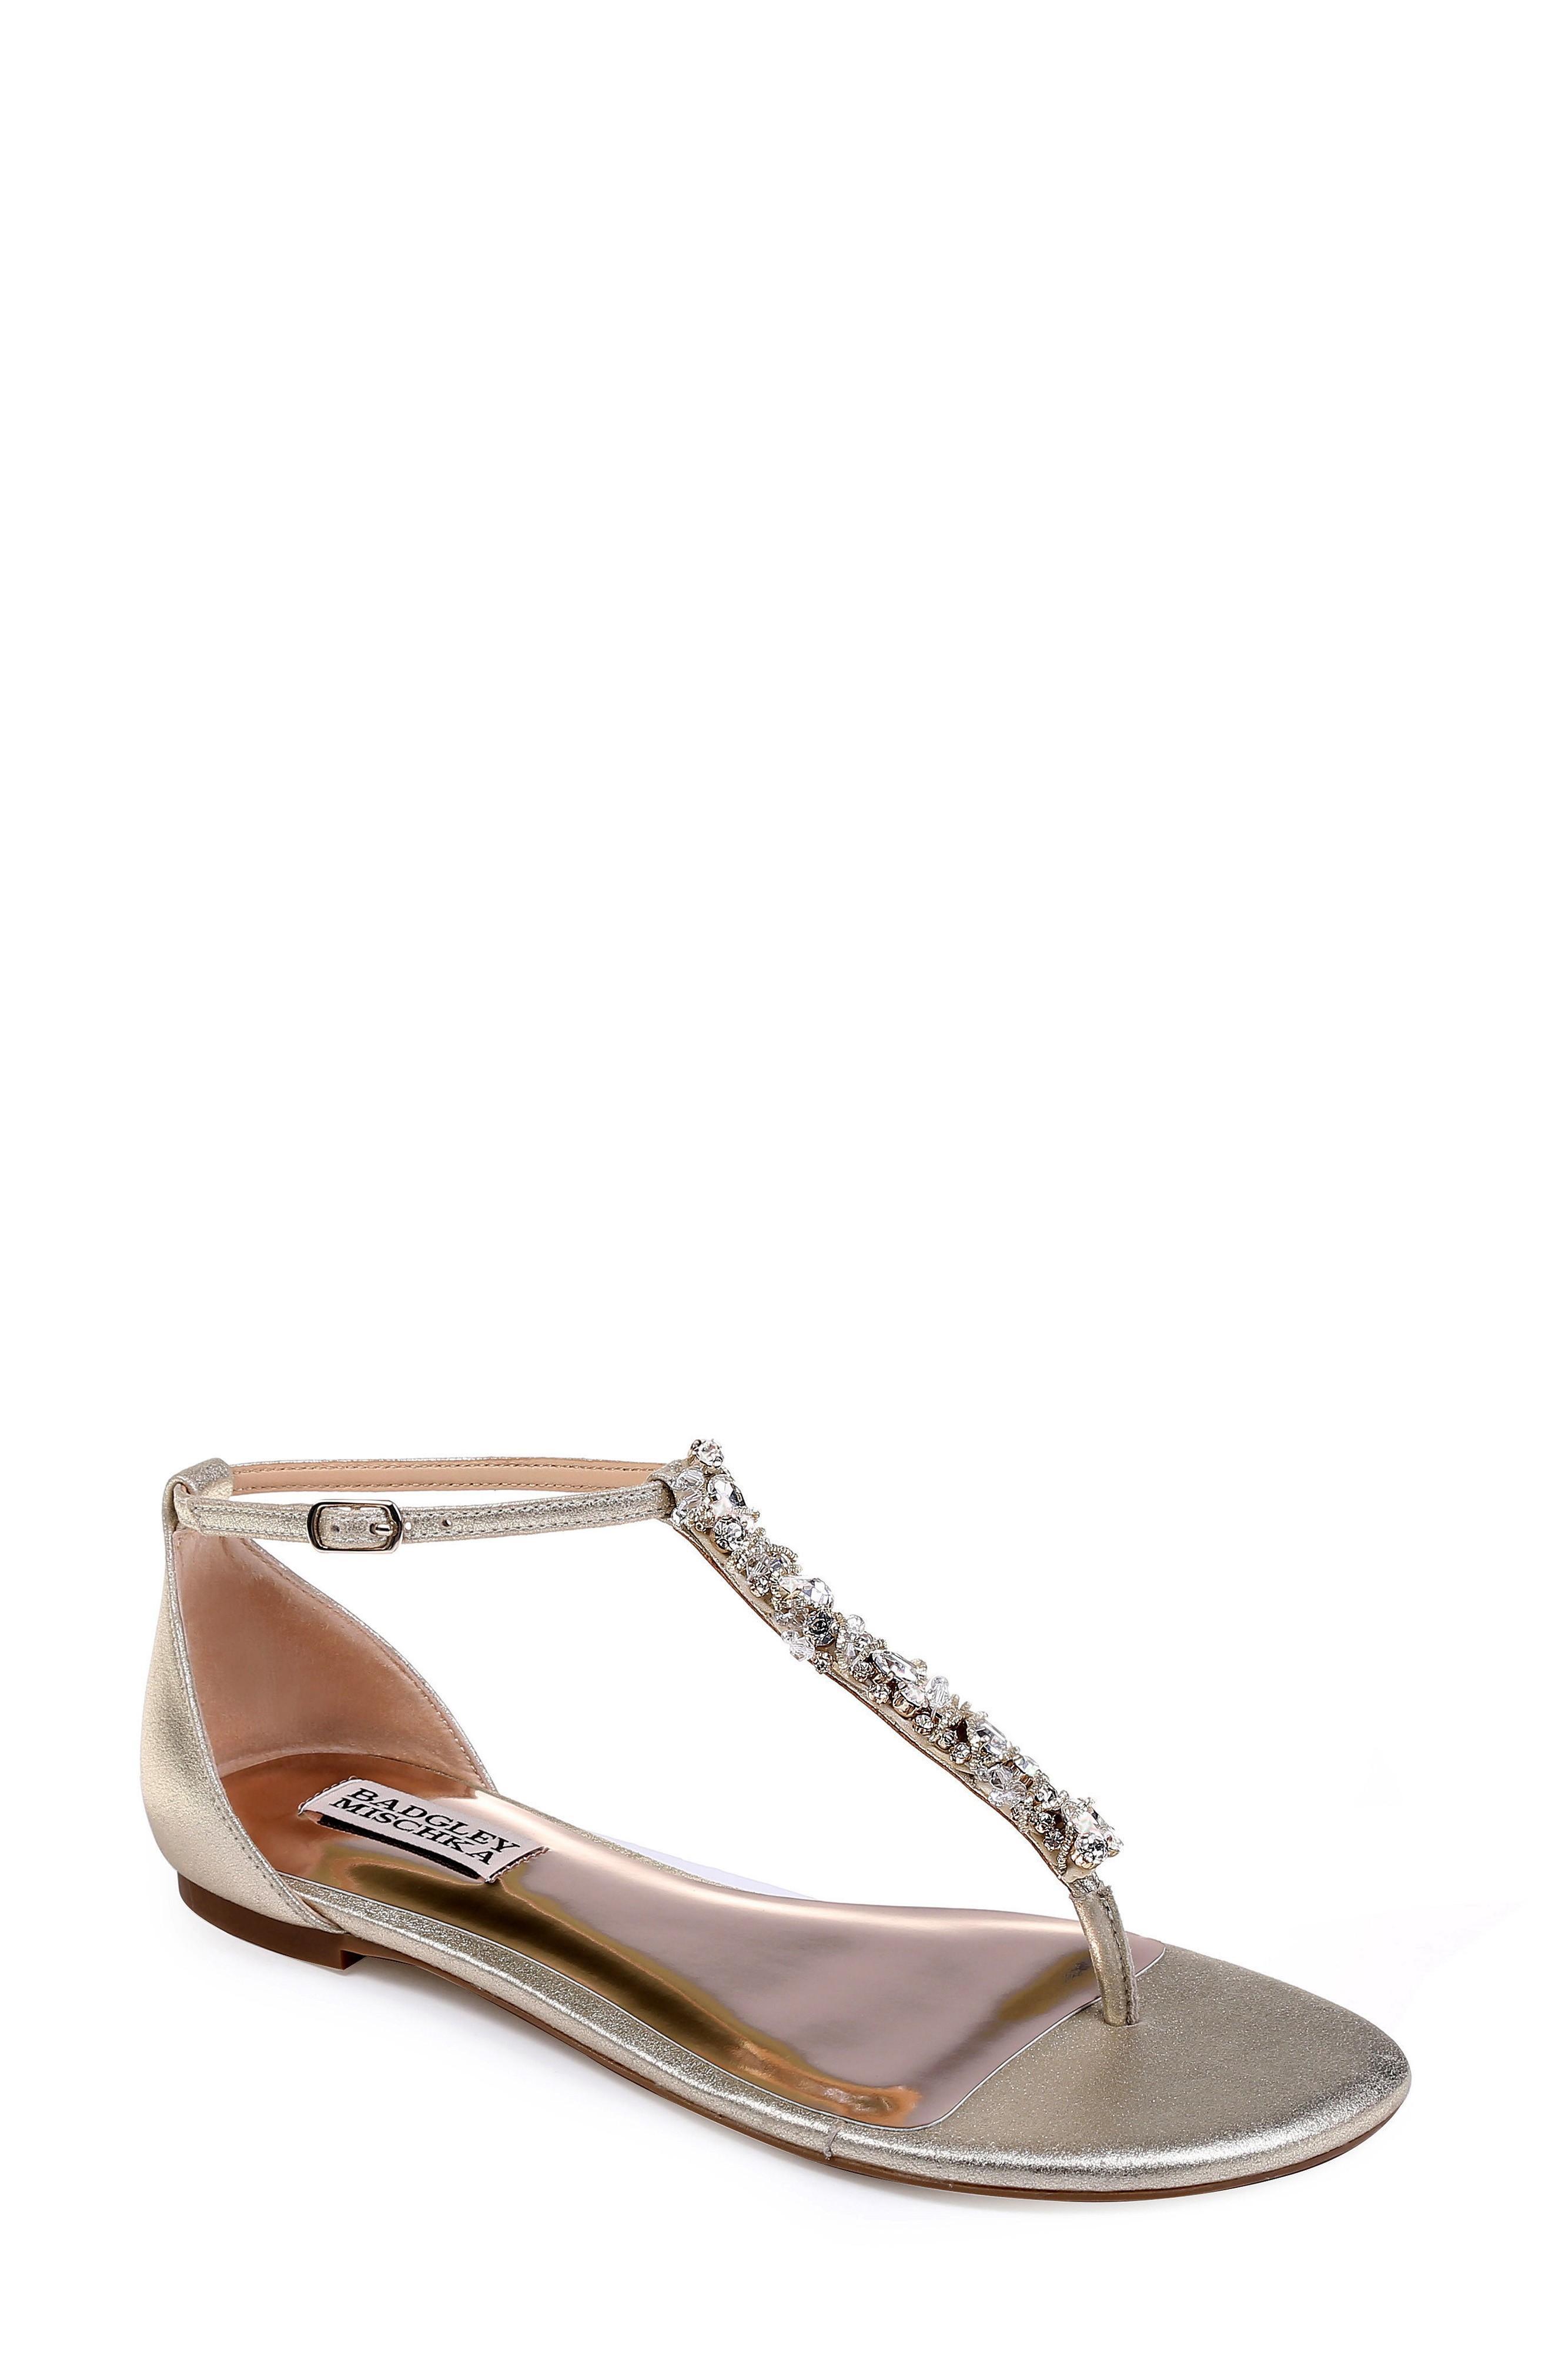 Badgley Mischka Holbrook T-Strap Sandal In Platino Metallic Suede